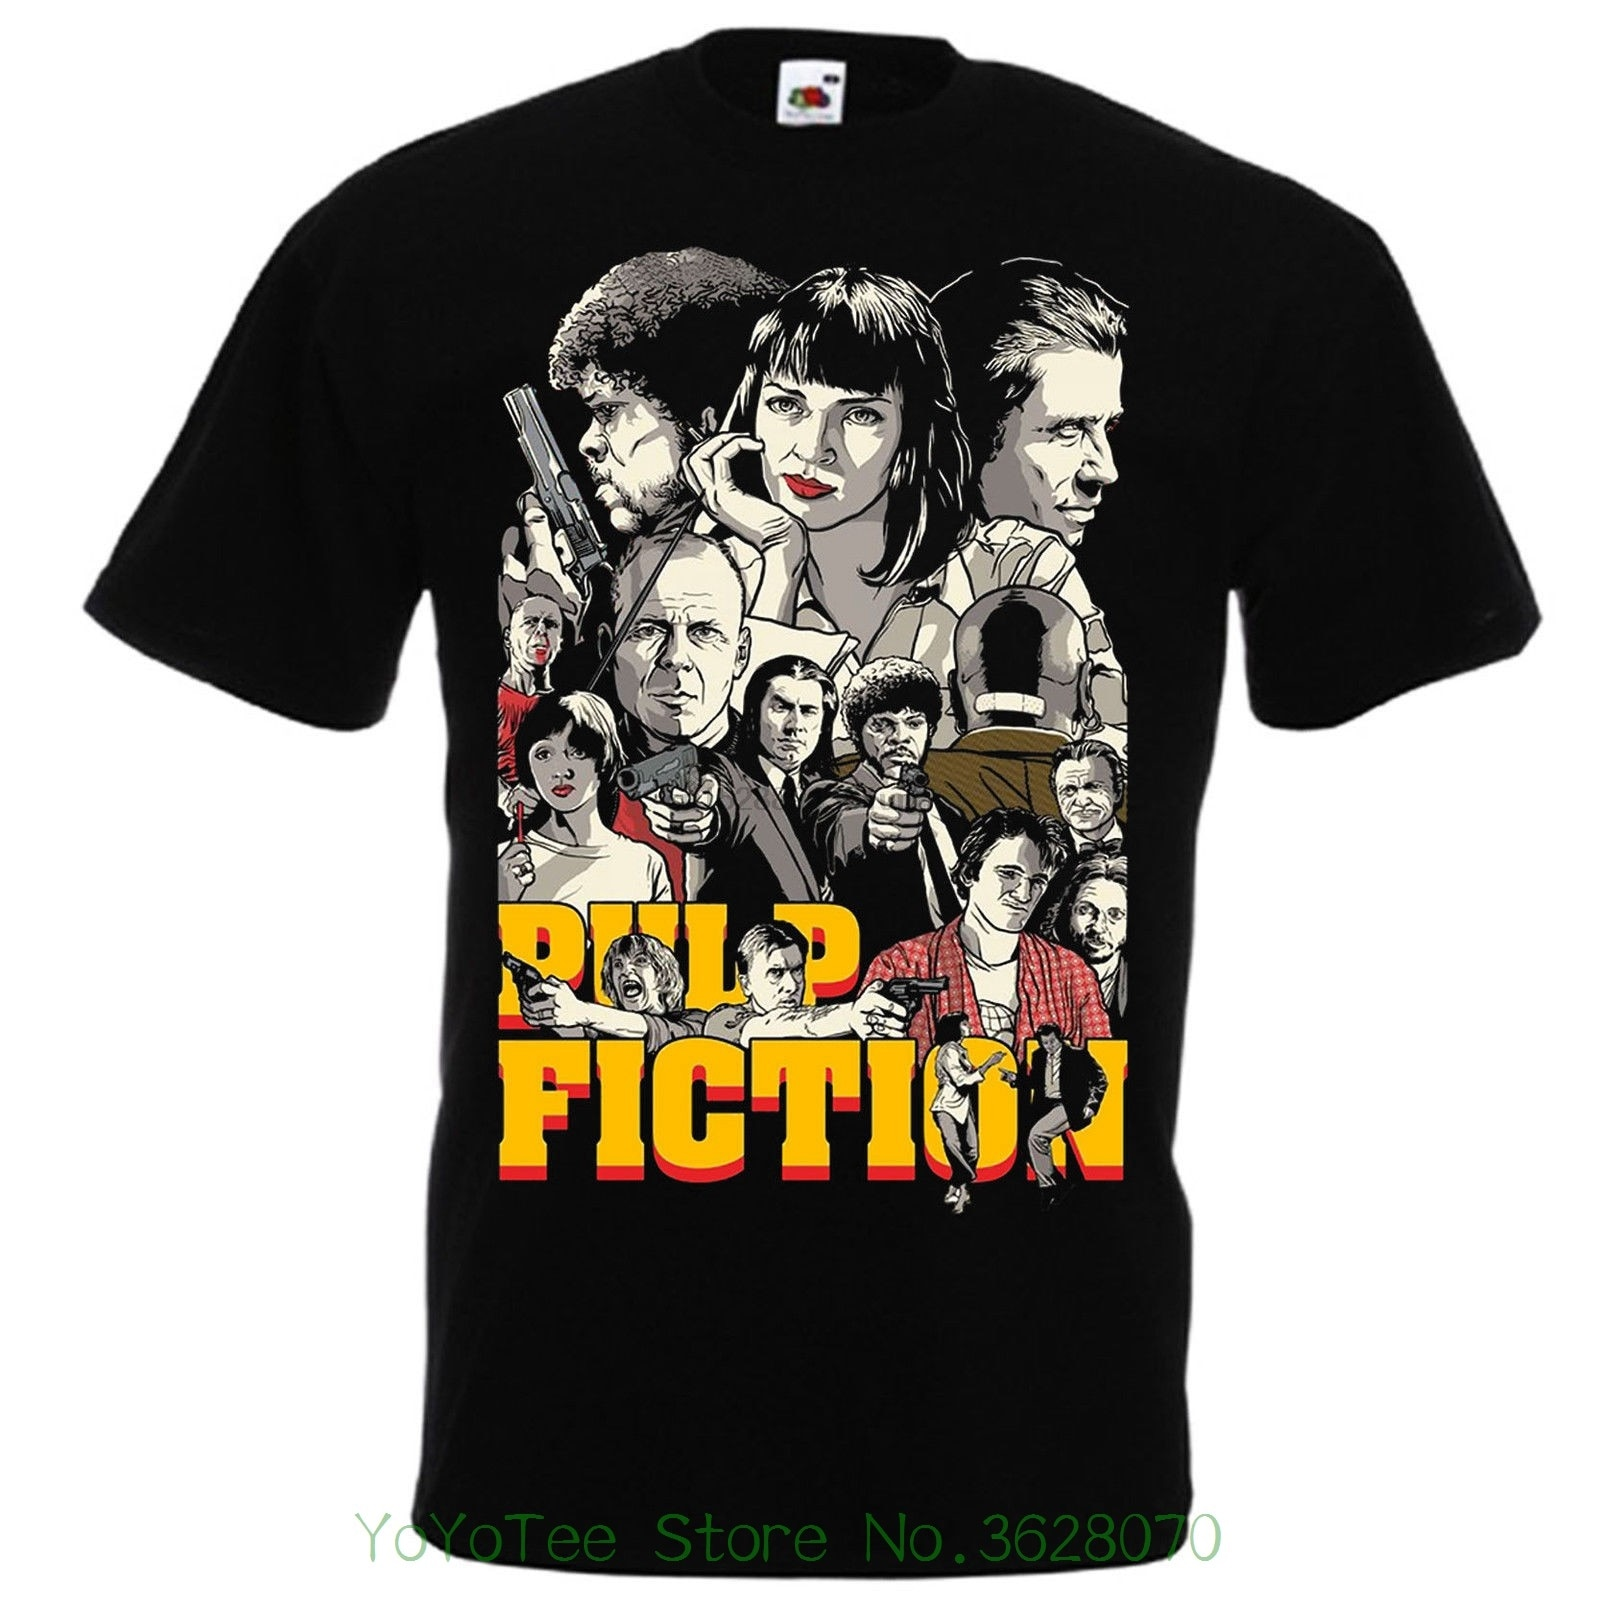 Camisetas de moda ajustada cuello redondo Pulp Fiction negro camiseta Quentin Tarantino #039 94 John Travolta Sam L. Jackson